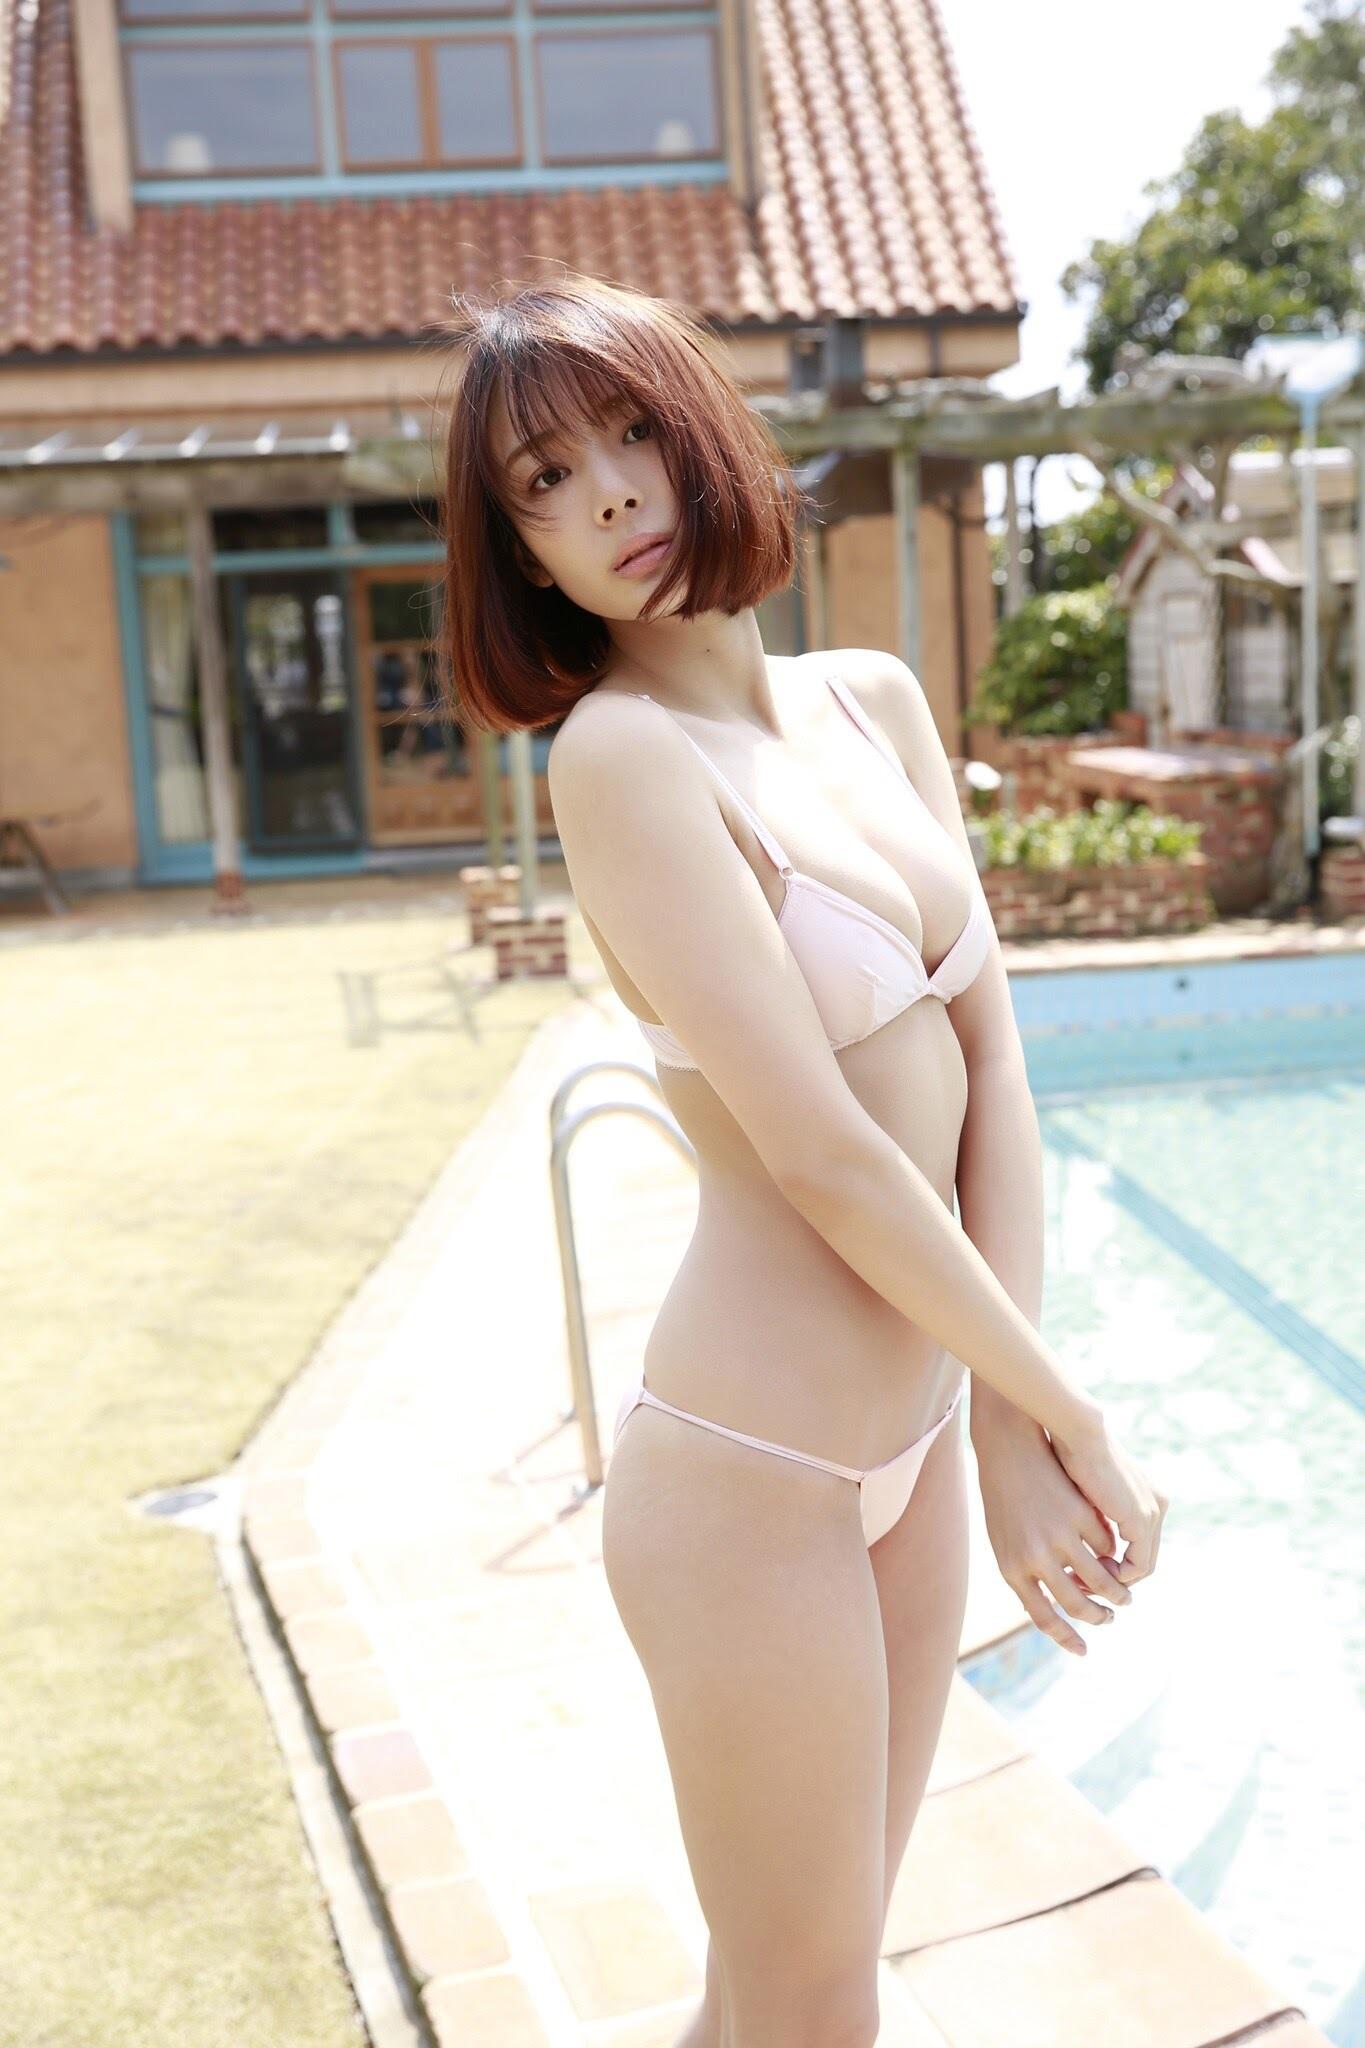 23 years old Shaka Okada, who is also a professional mahjong player004